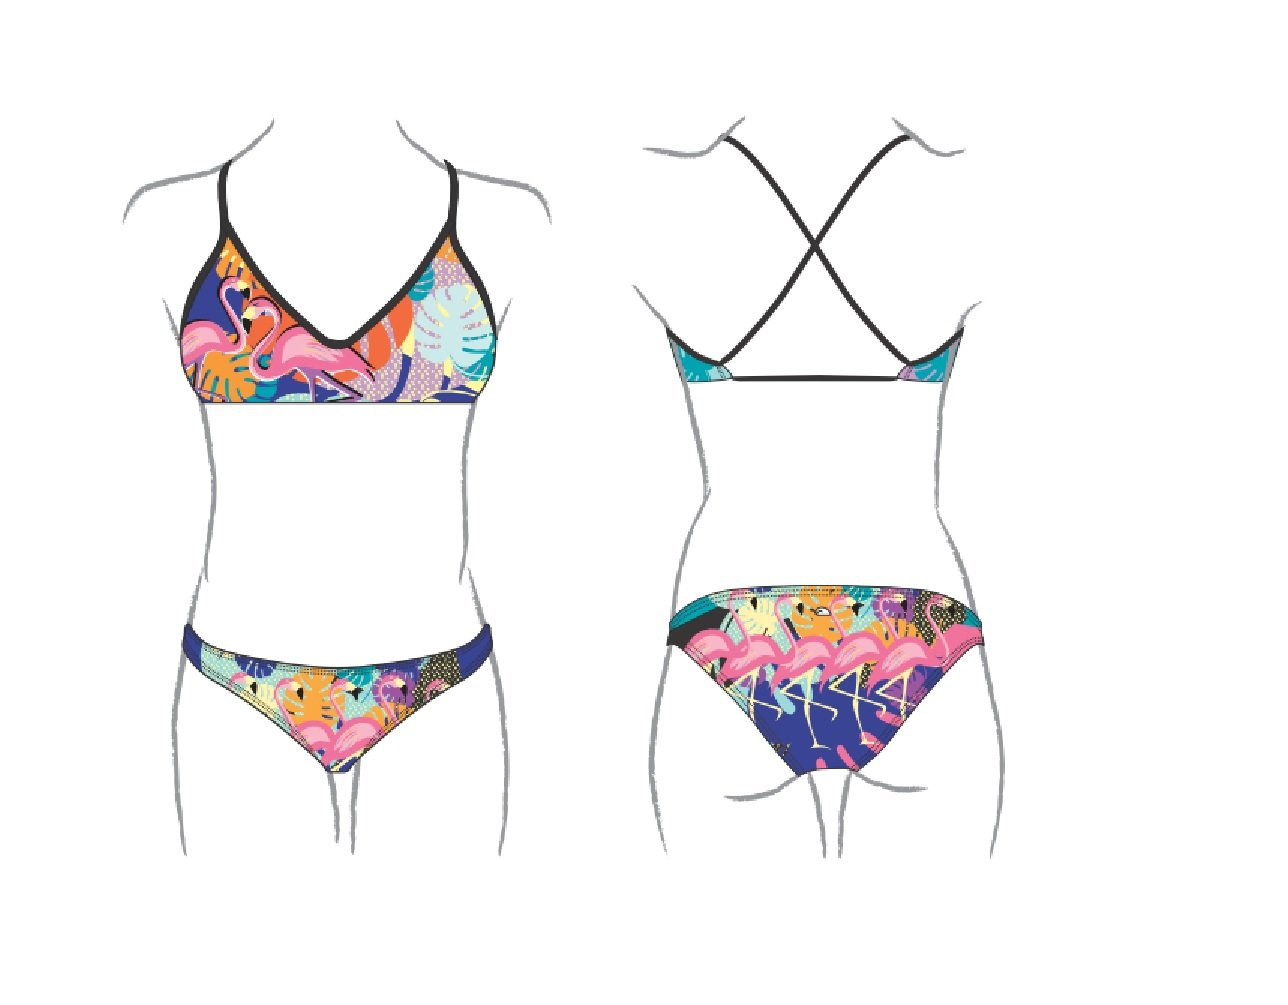 Turbo Bikini Flamingo swimkini Sport nadar - Mix + Match Bikini, morado, 38: Amazon.es: Deportes y aire libre